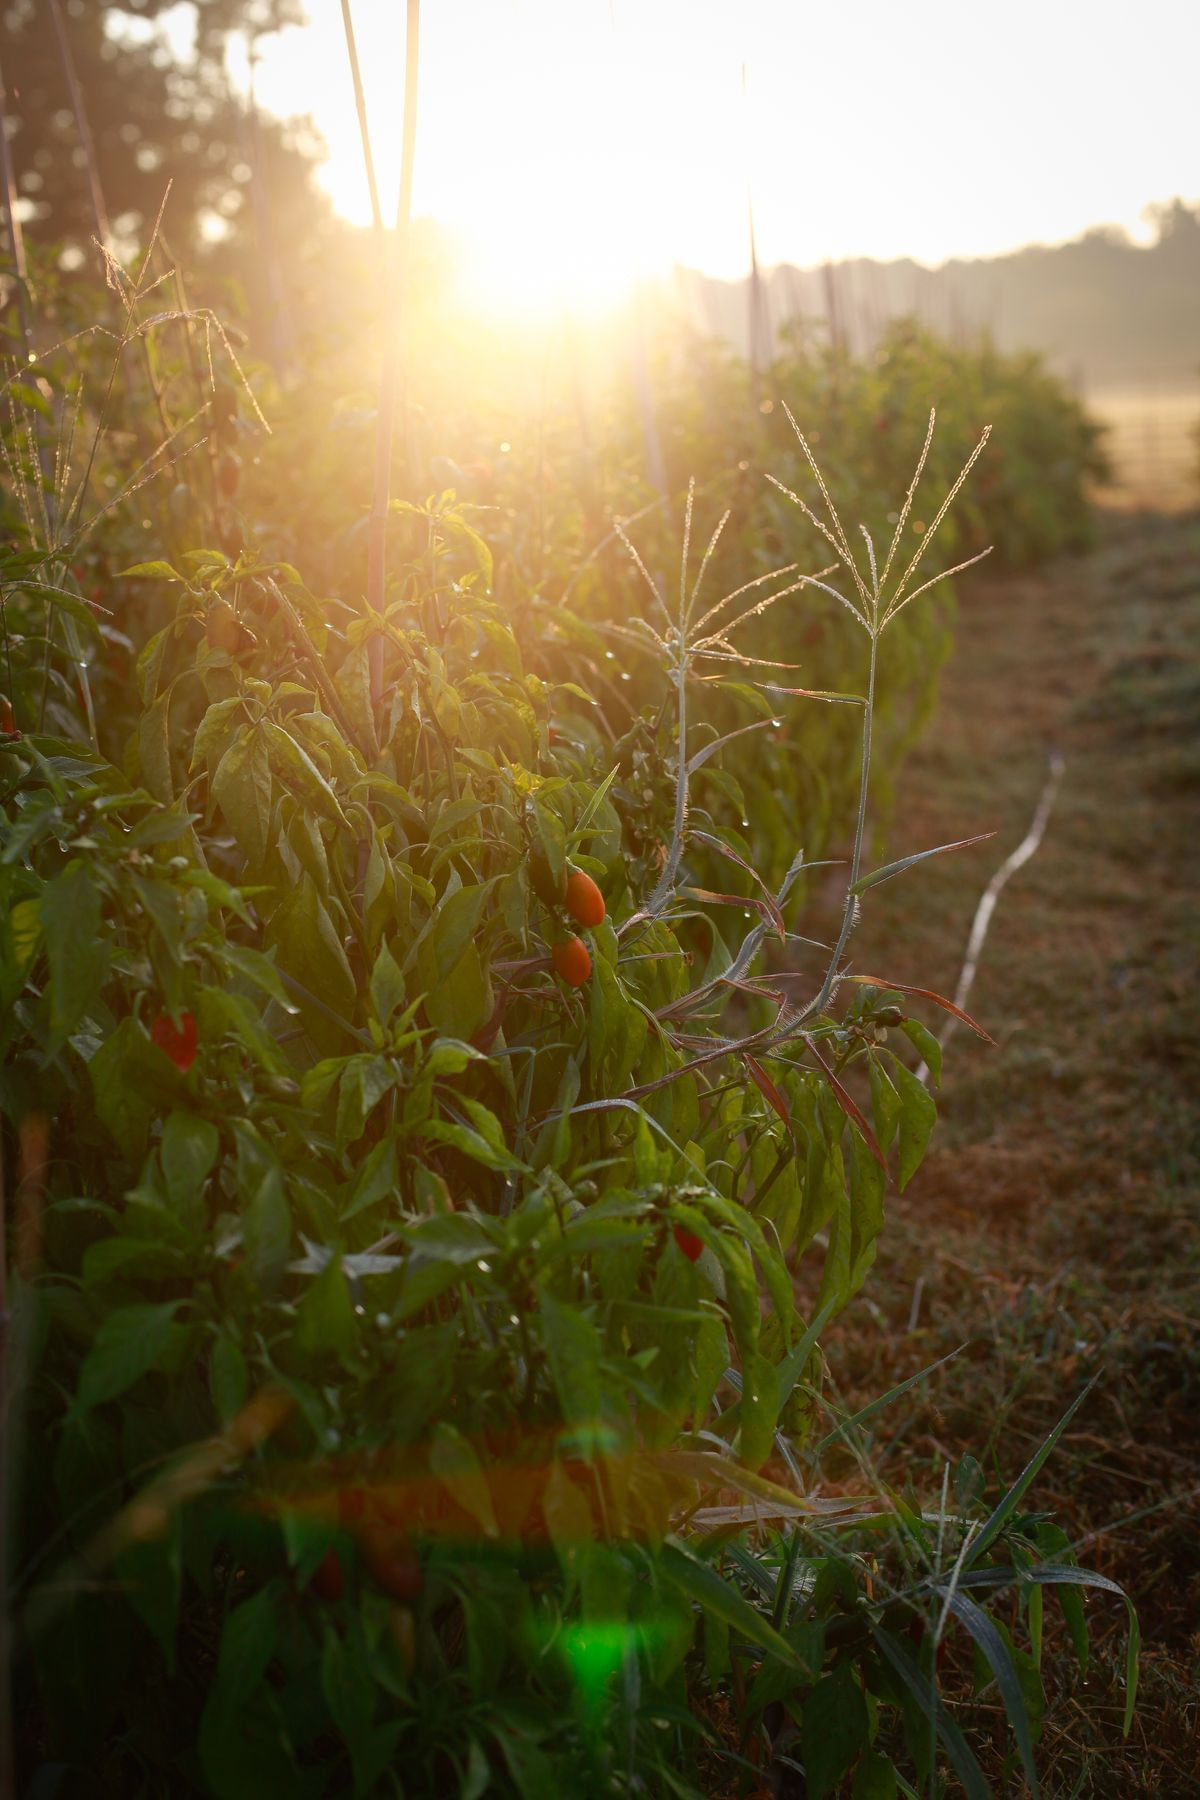 farmland with produce